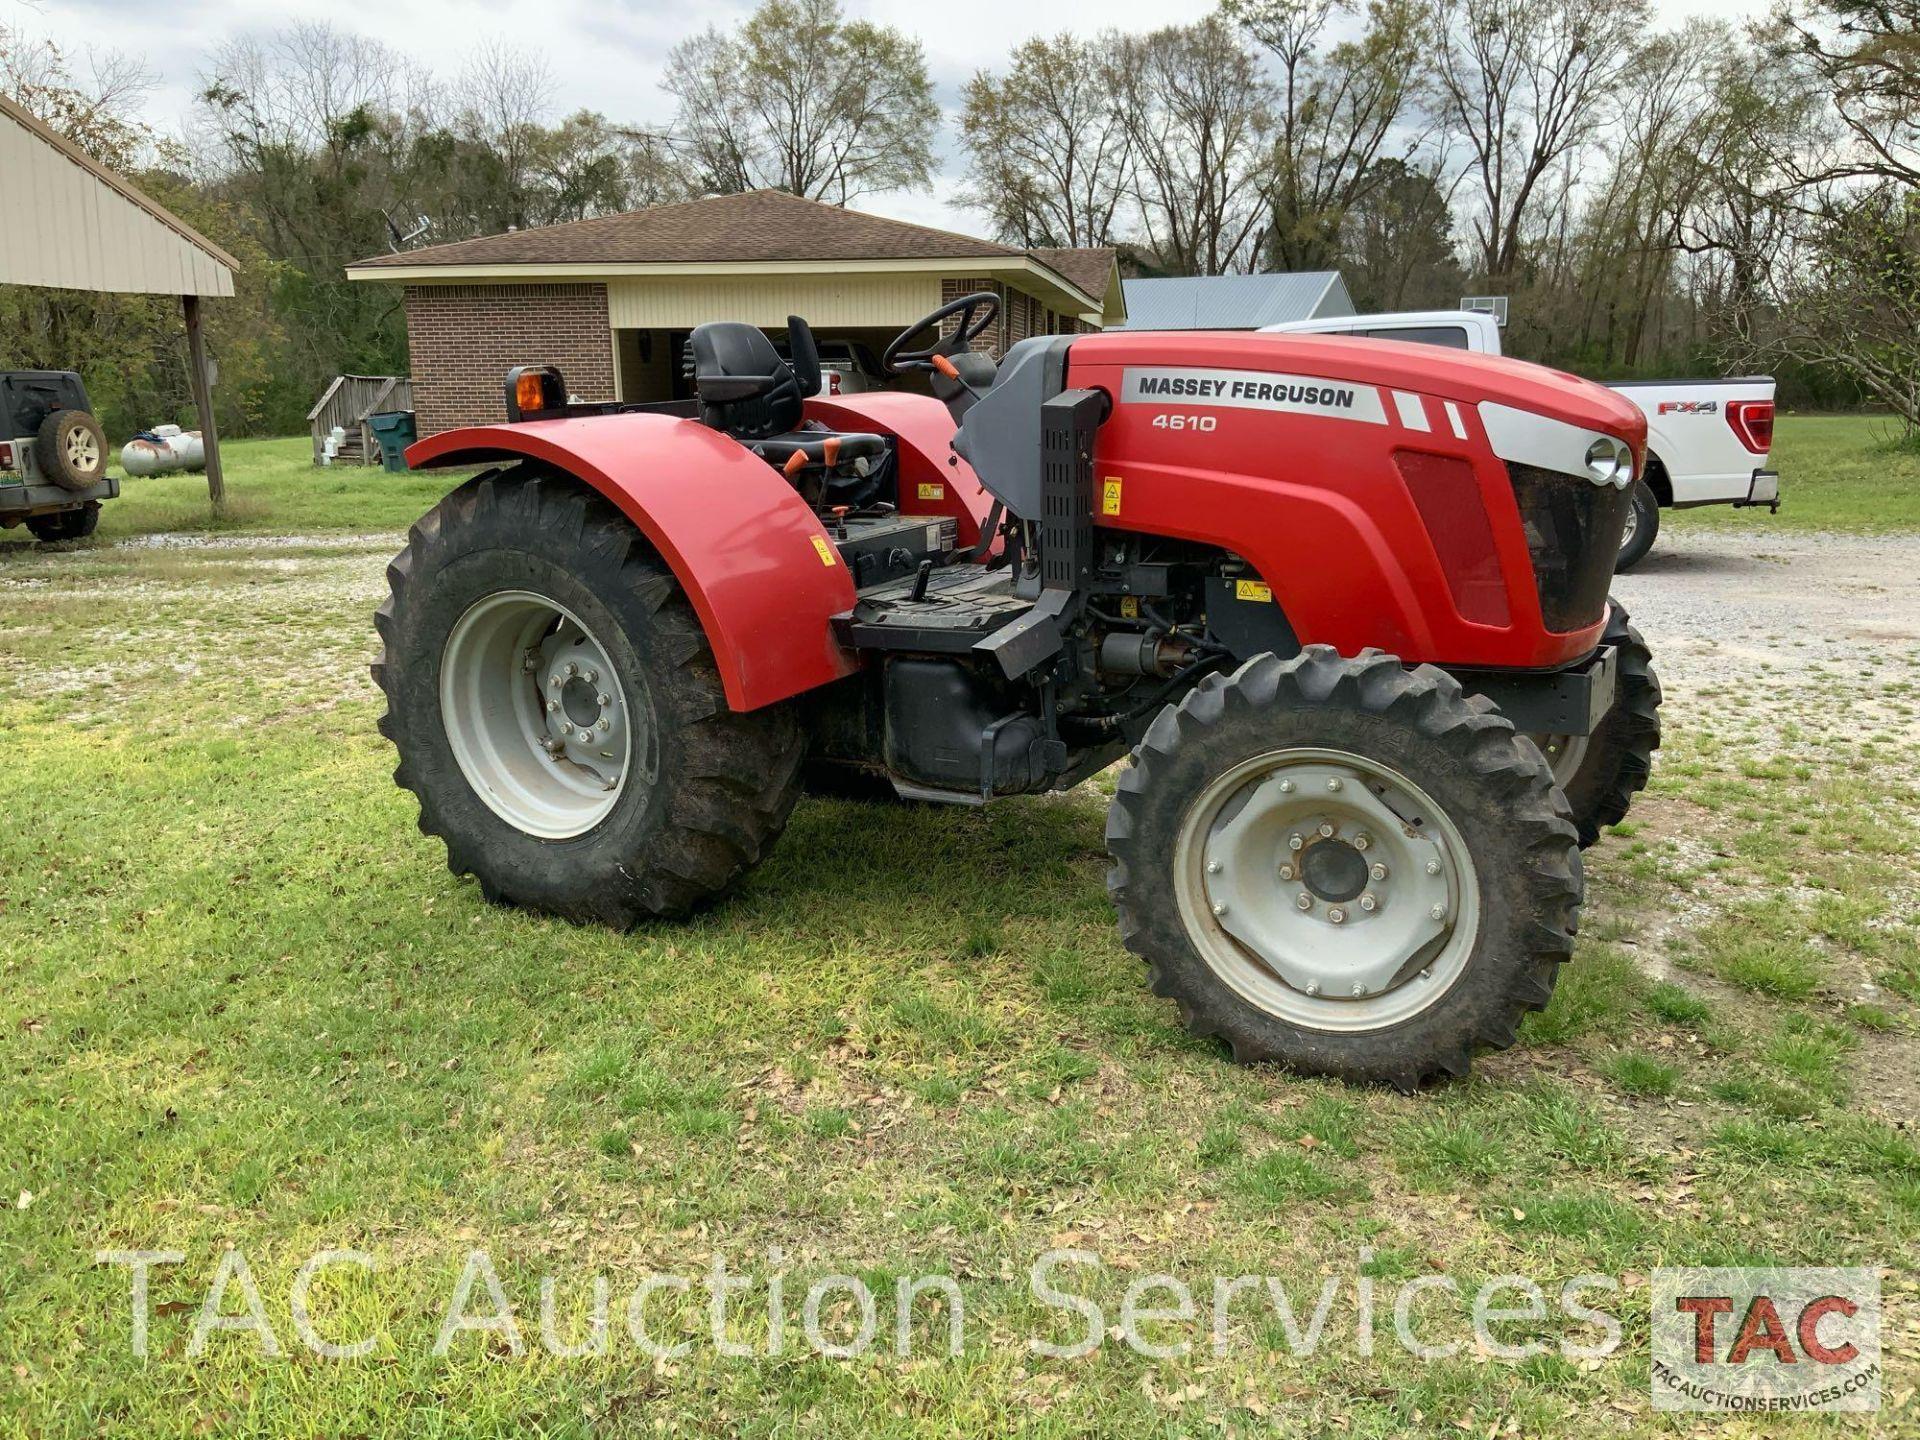 Massey-Ferguson 4610LP Farm Tractor - Image 10 of 26